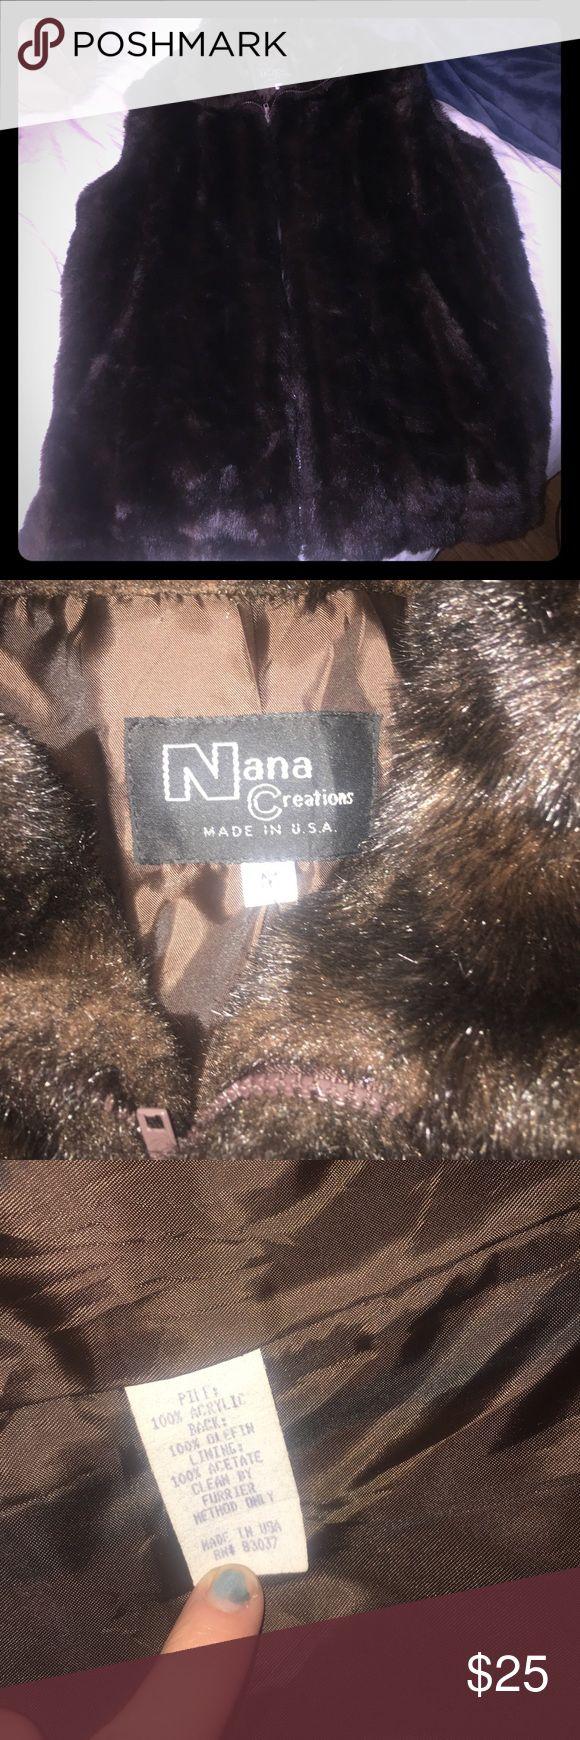 Long Brown Fur Vest size medium Size medium length 32 inches zippers fully closed NaNa Jackets & Coats Vests